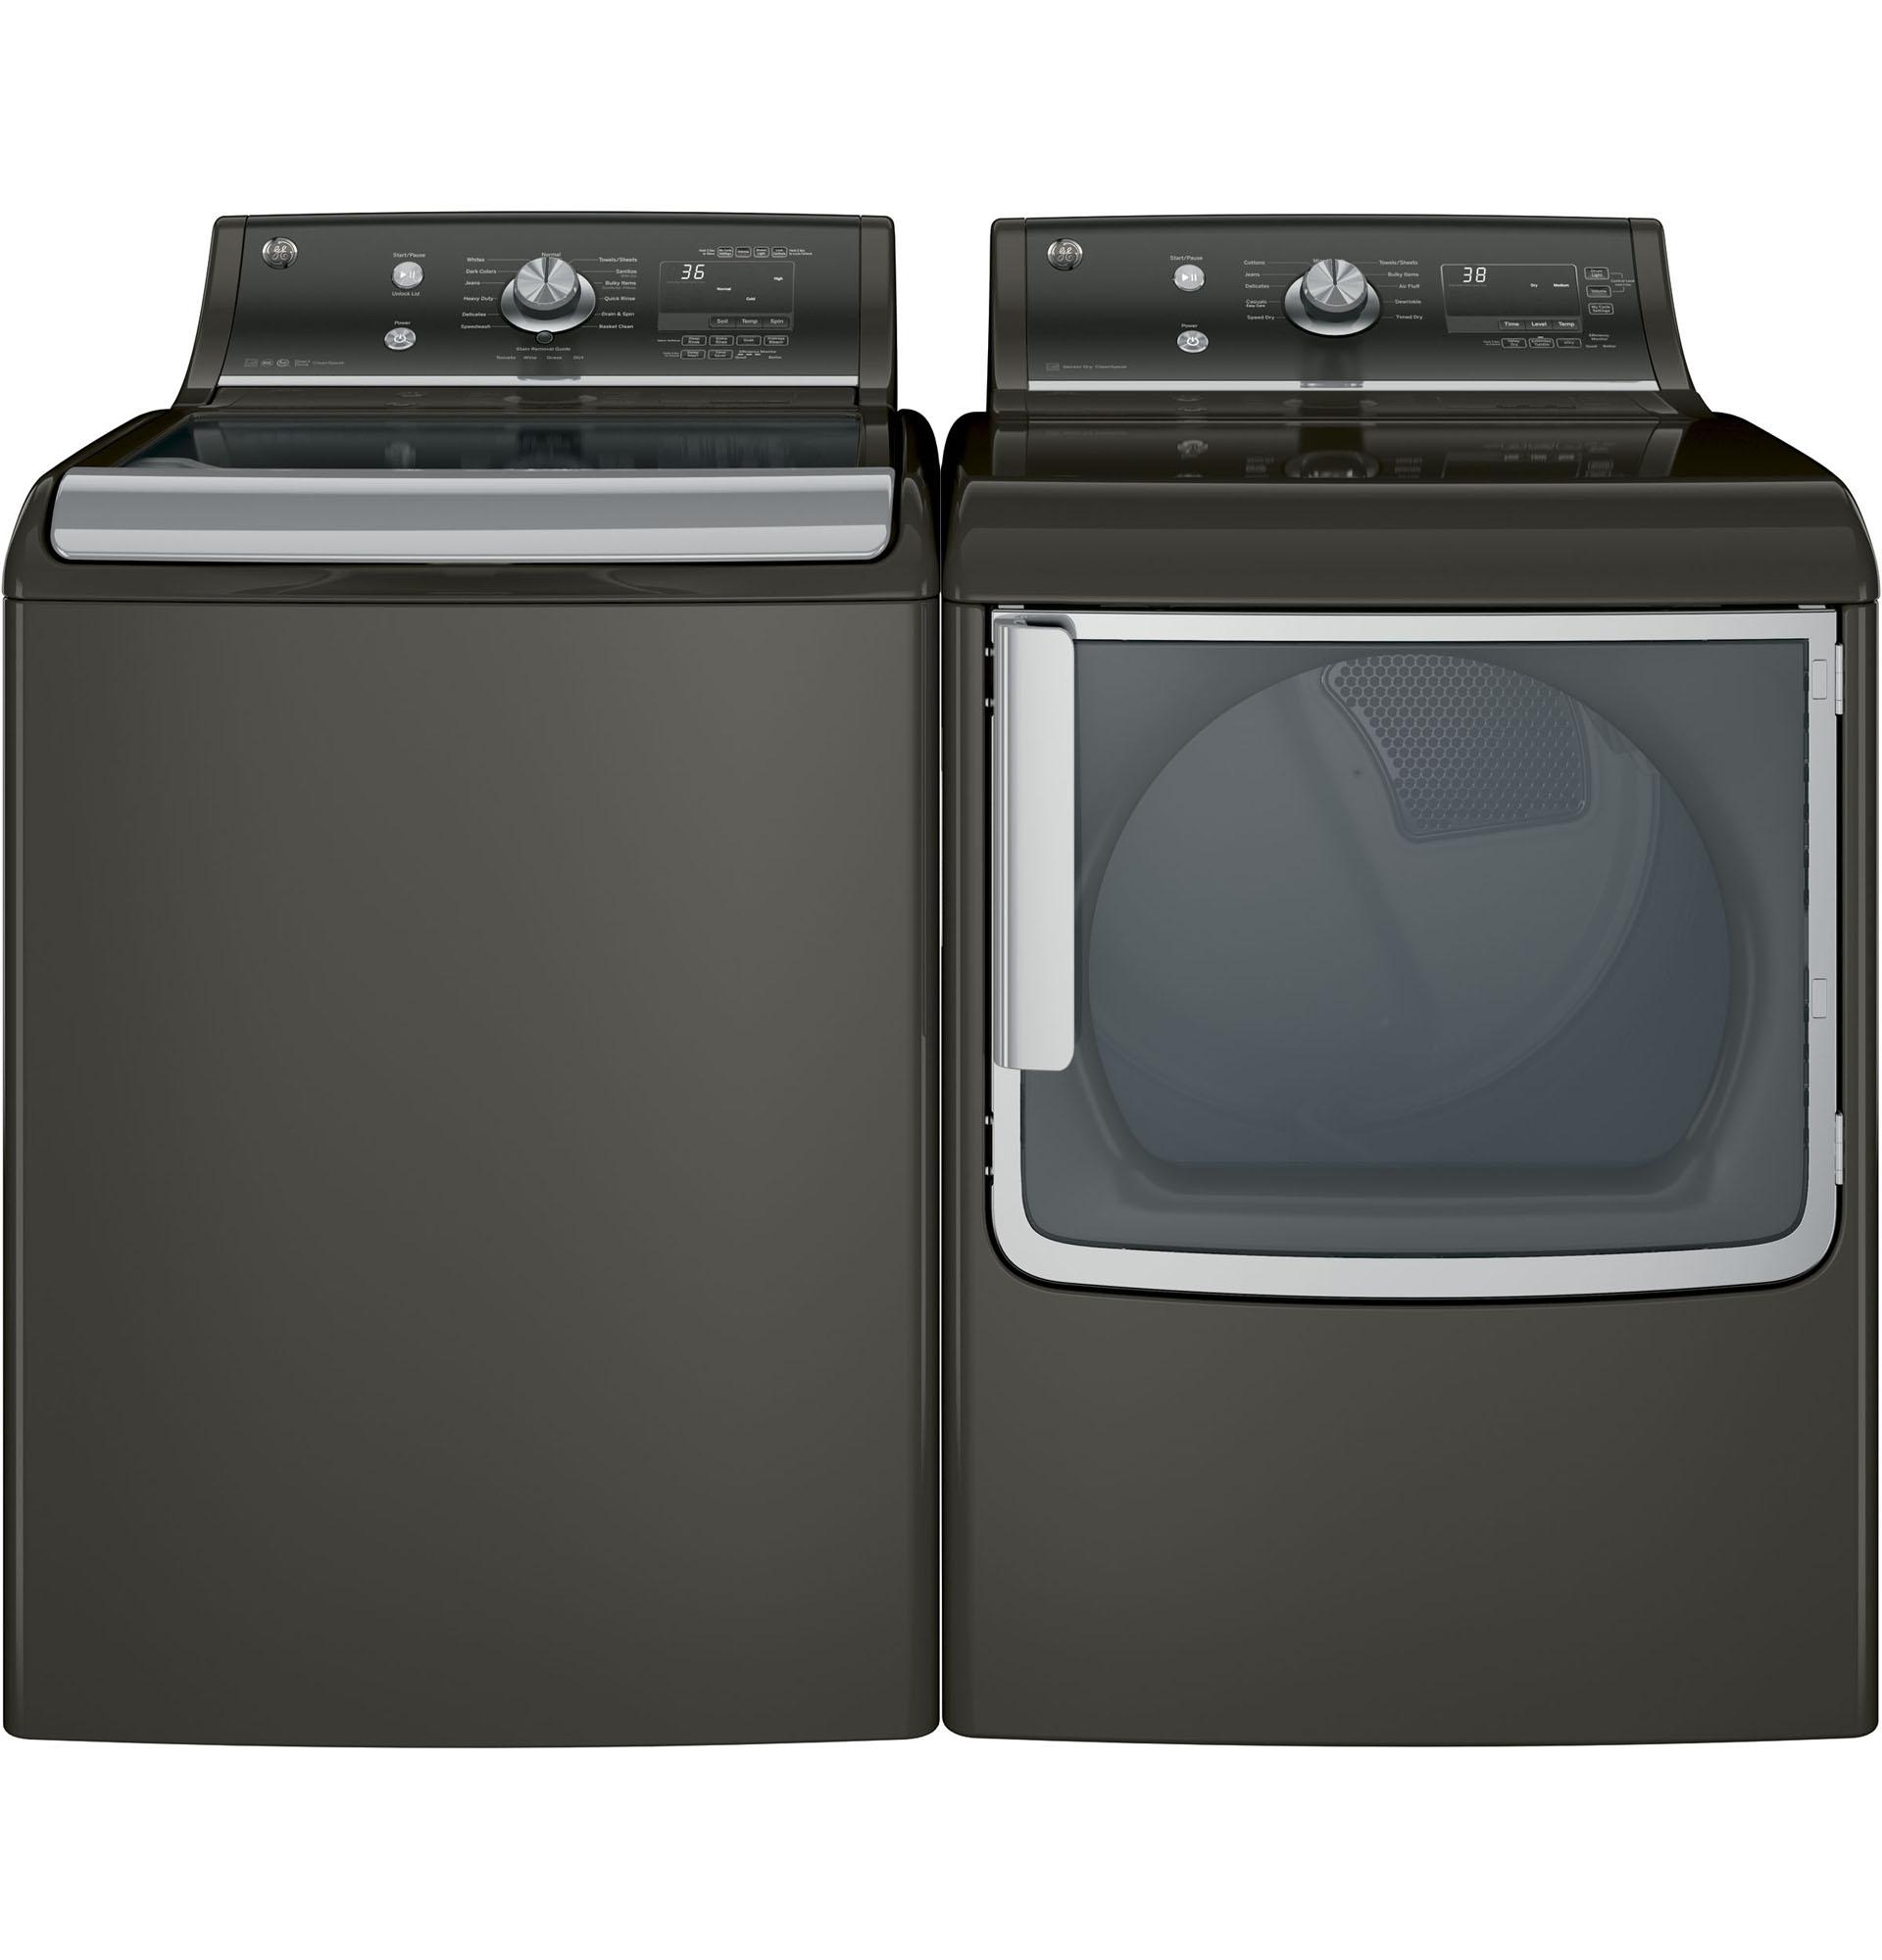 GE Appliances GTD81ESPJMC 7.8 cu. ft. Electric Dryer - Metallic